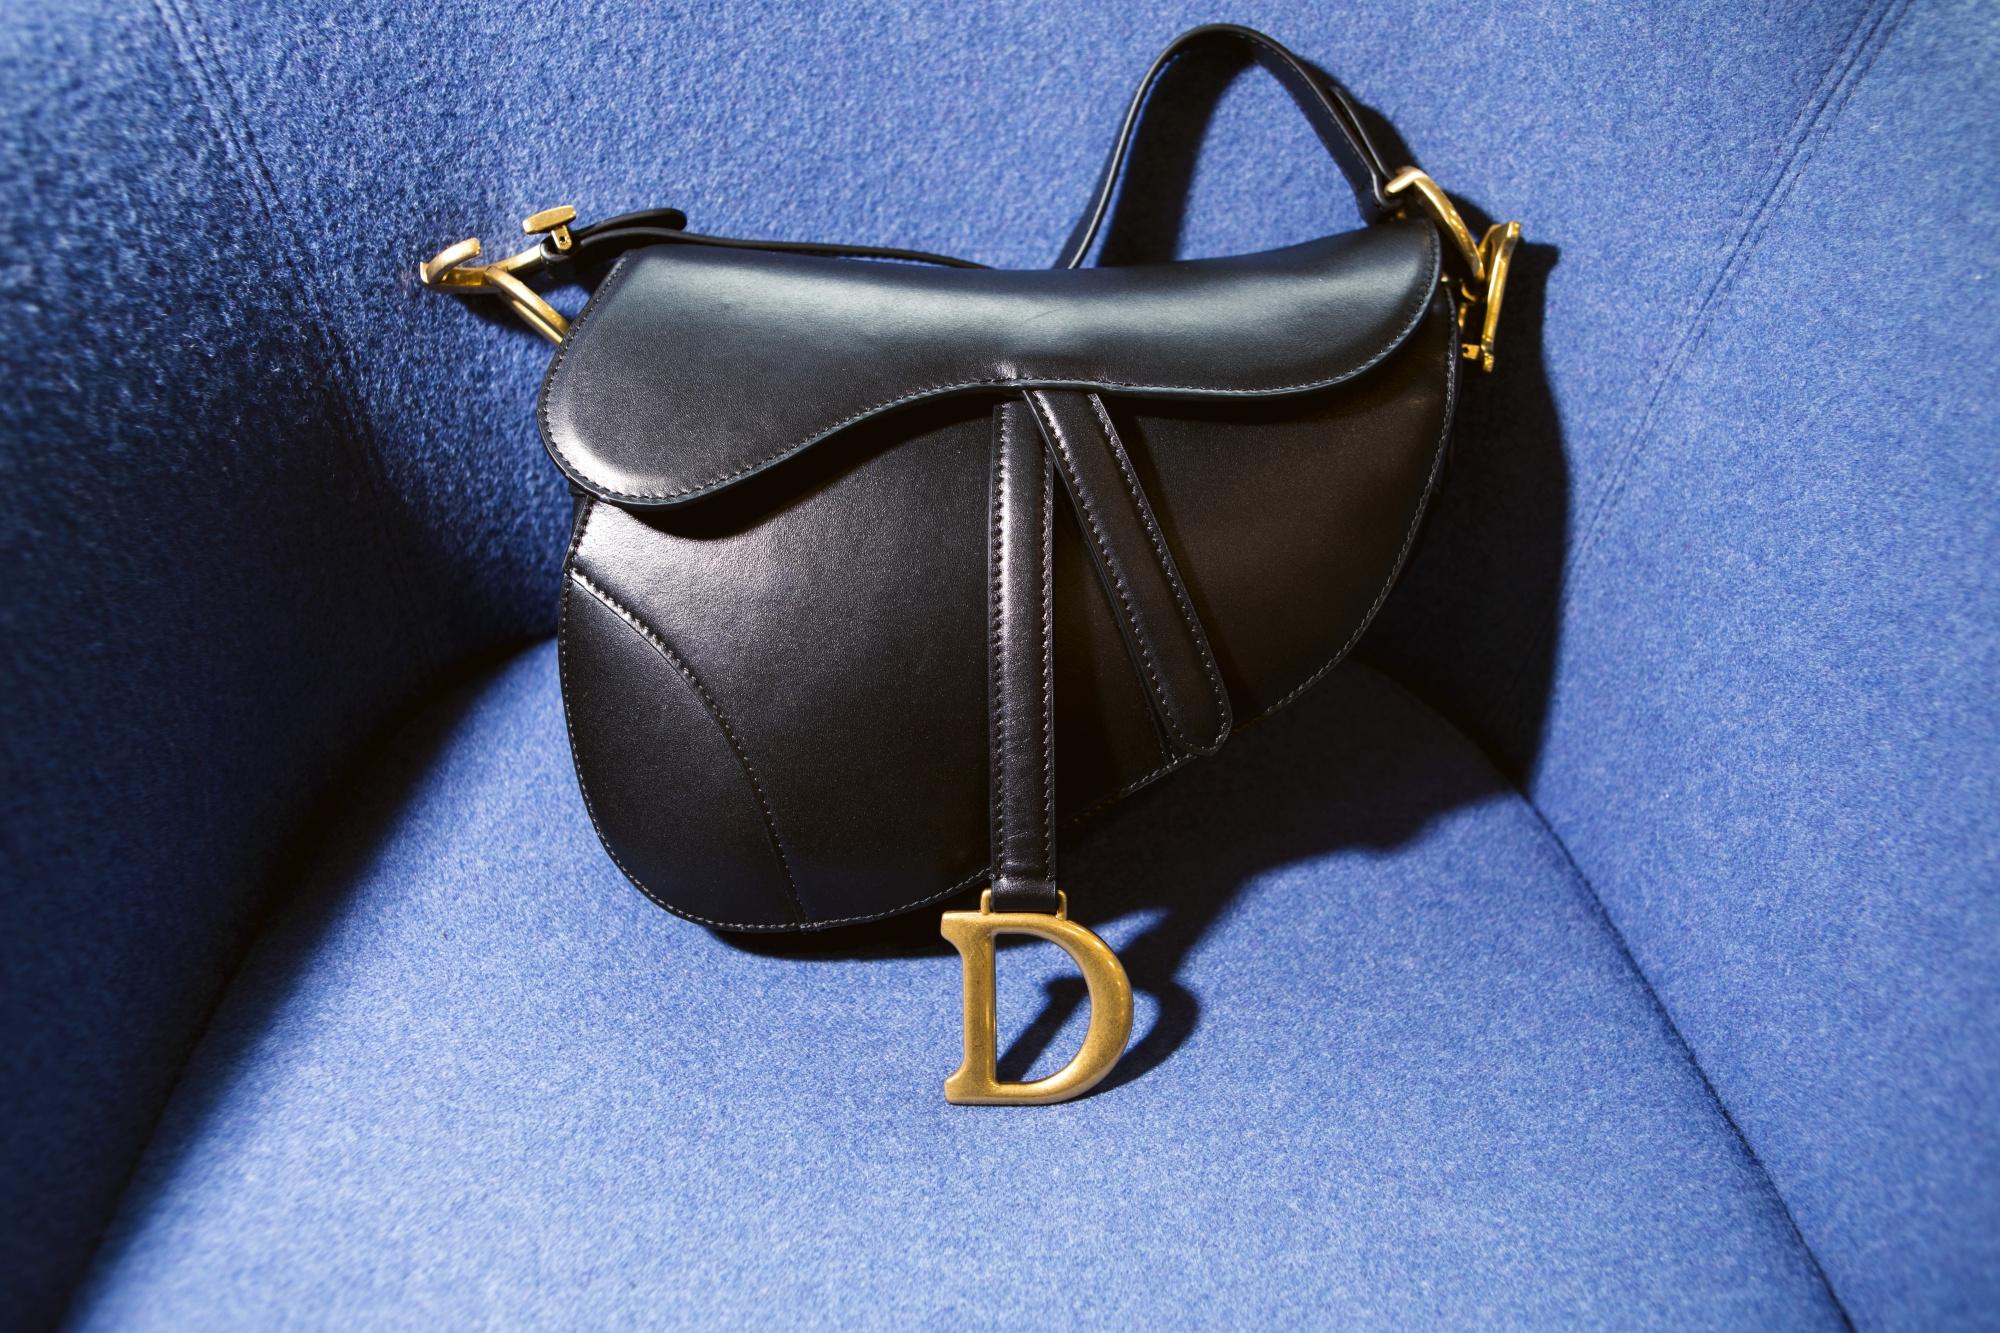 A counterfeit Dior saddle bag.